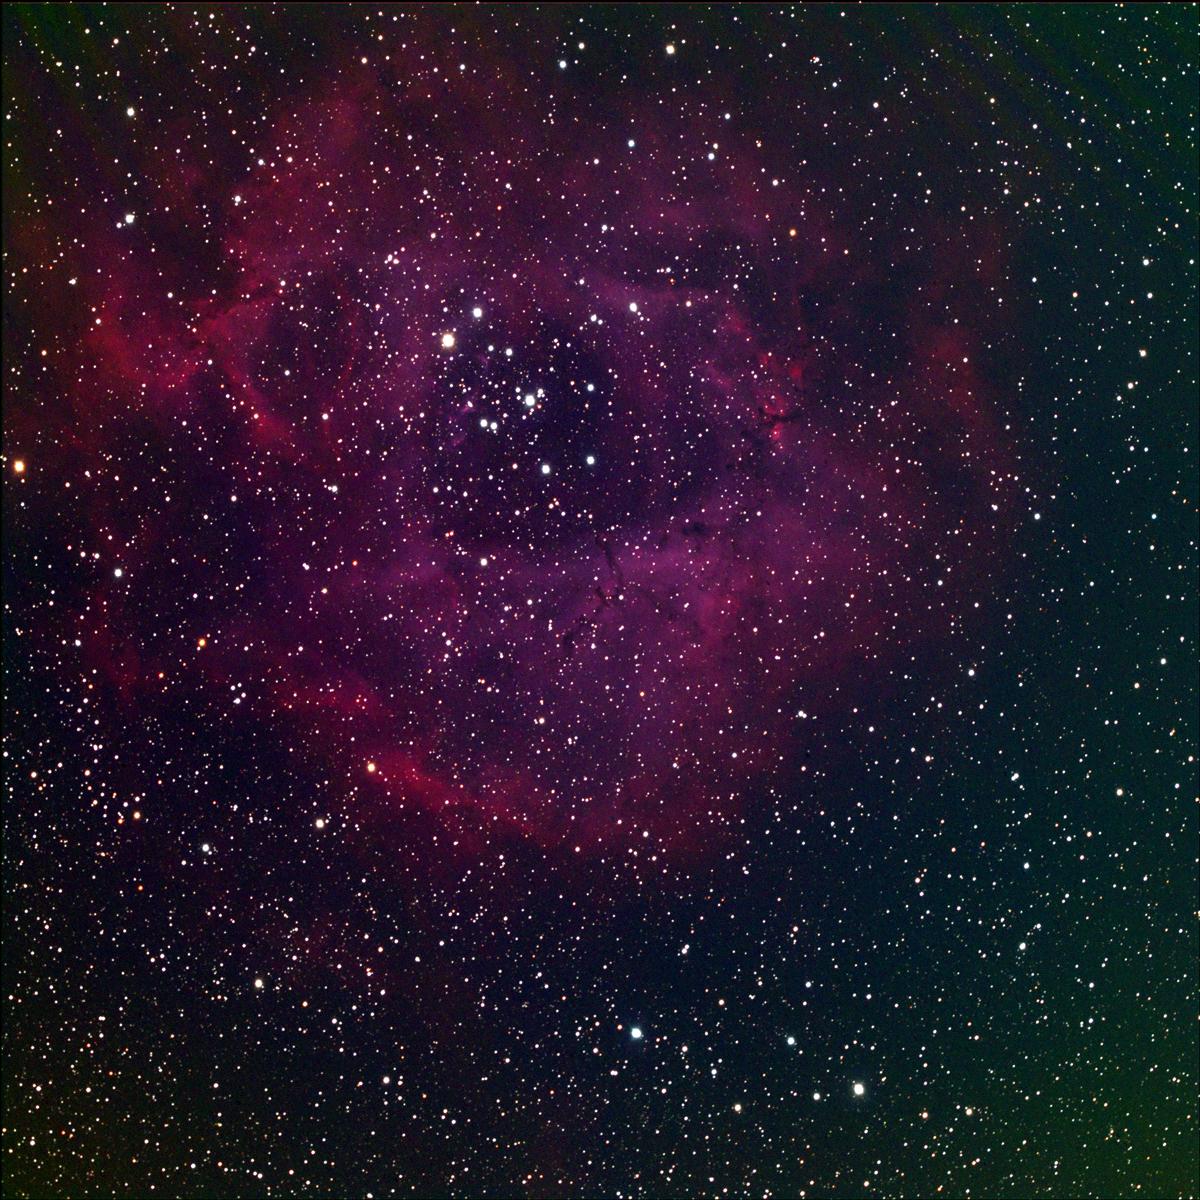 NGC 2237 - The Rosette Nebula